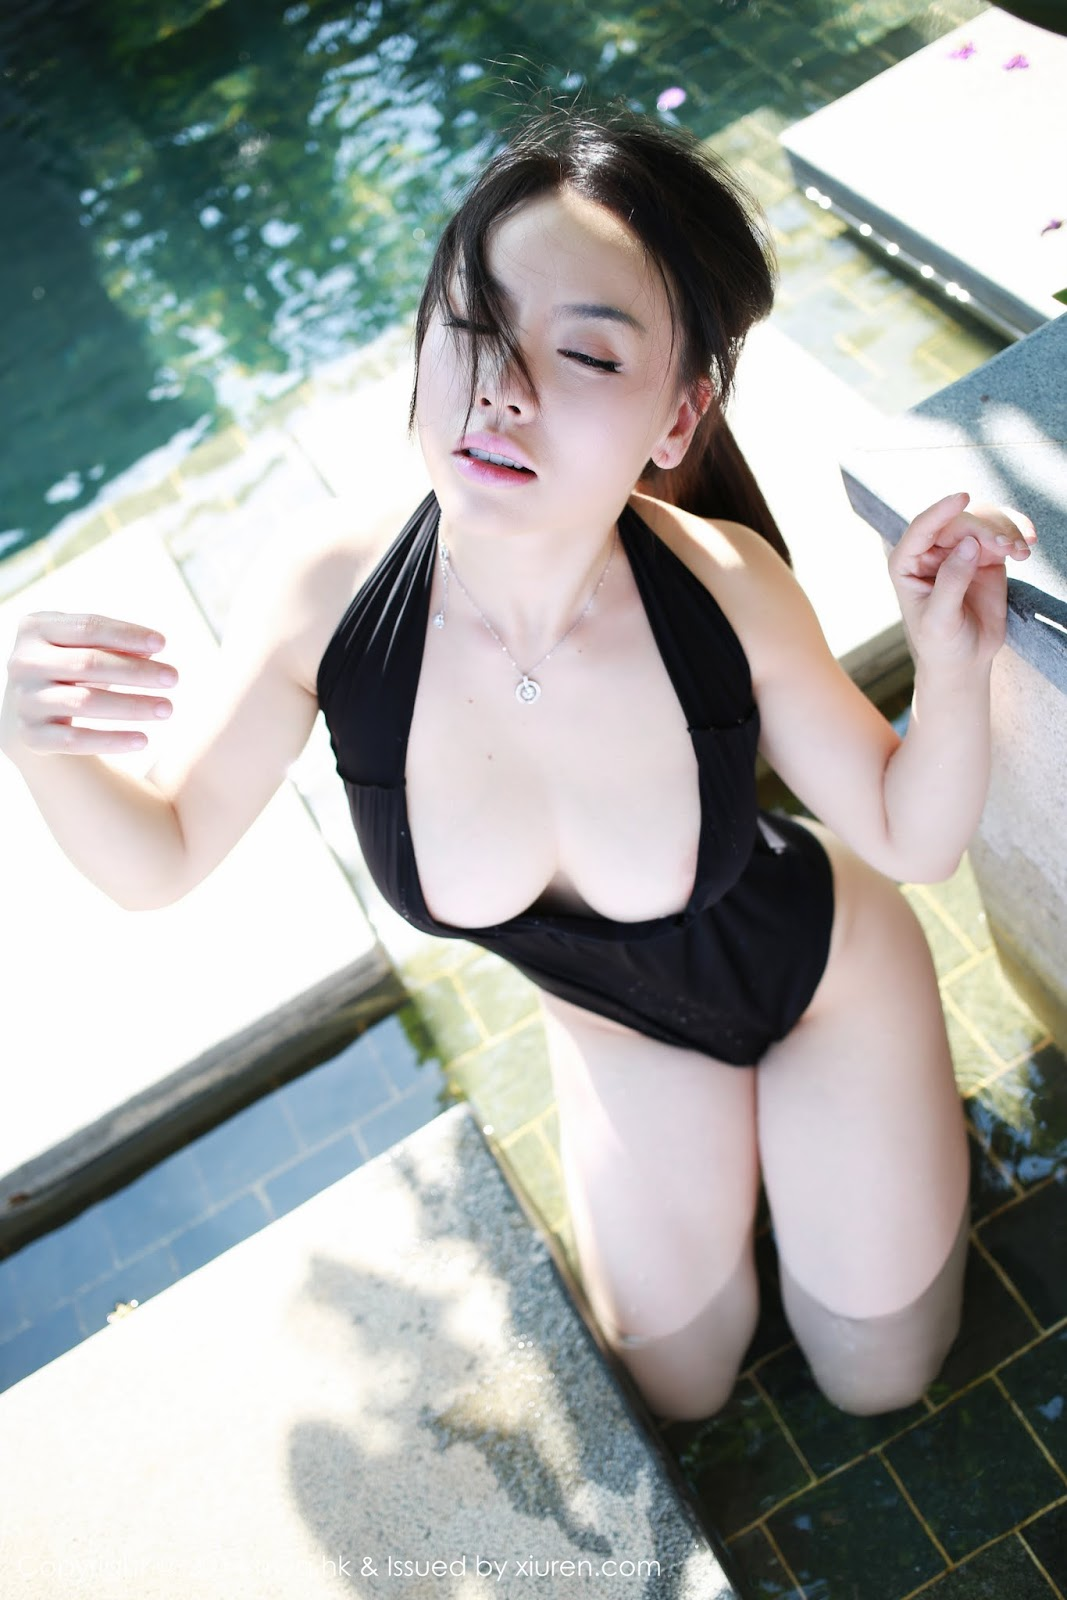 40037 100 - MYGIRL VOL.30 Photo Nude Hot Sexy